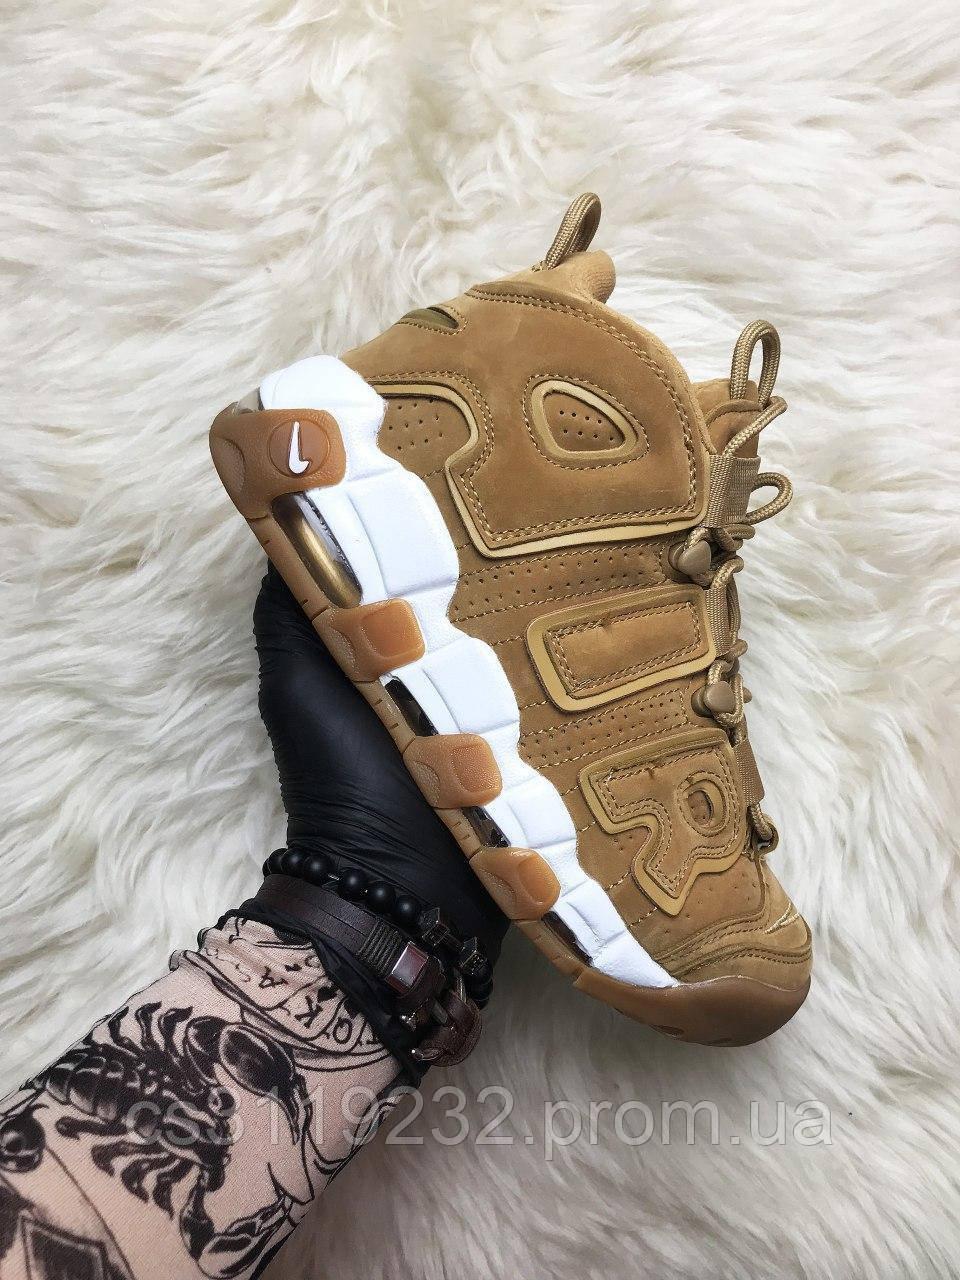 Мужские кроссовки Nike Air More Uptempo Beige White Flex (бежевые)